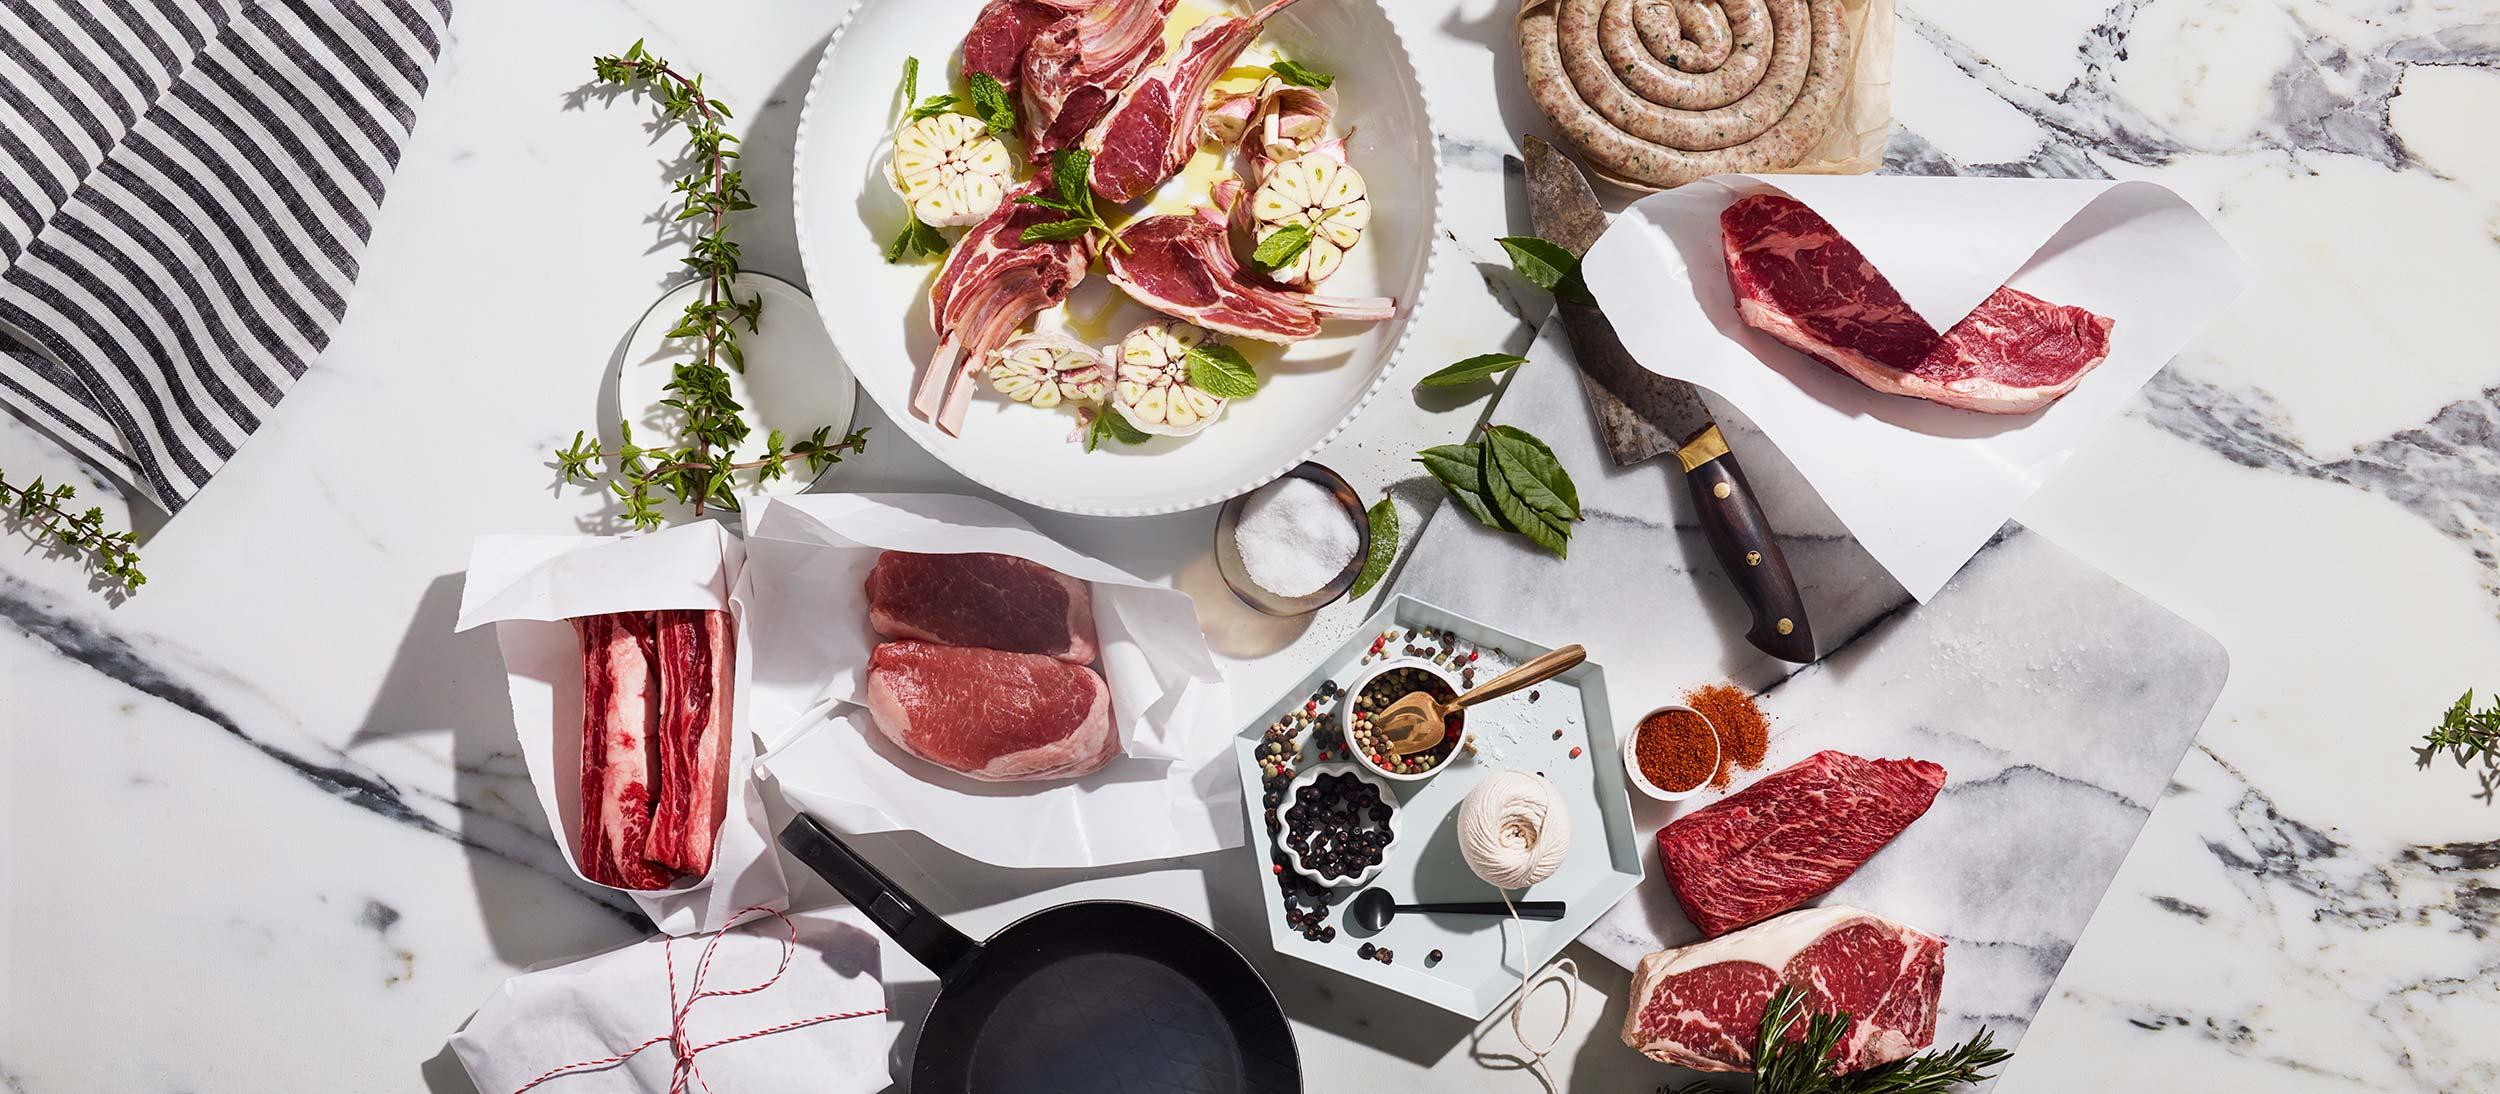 City-Acres-Meat.jpg